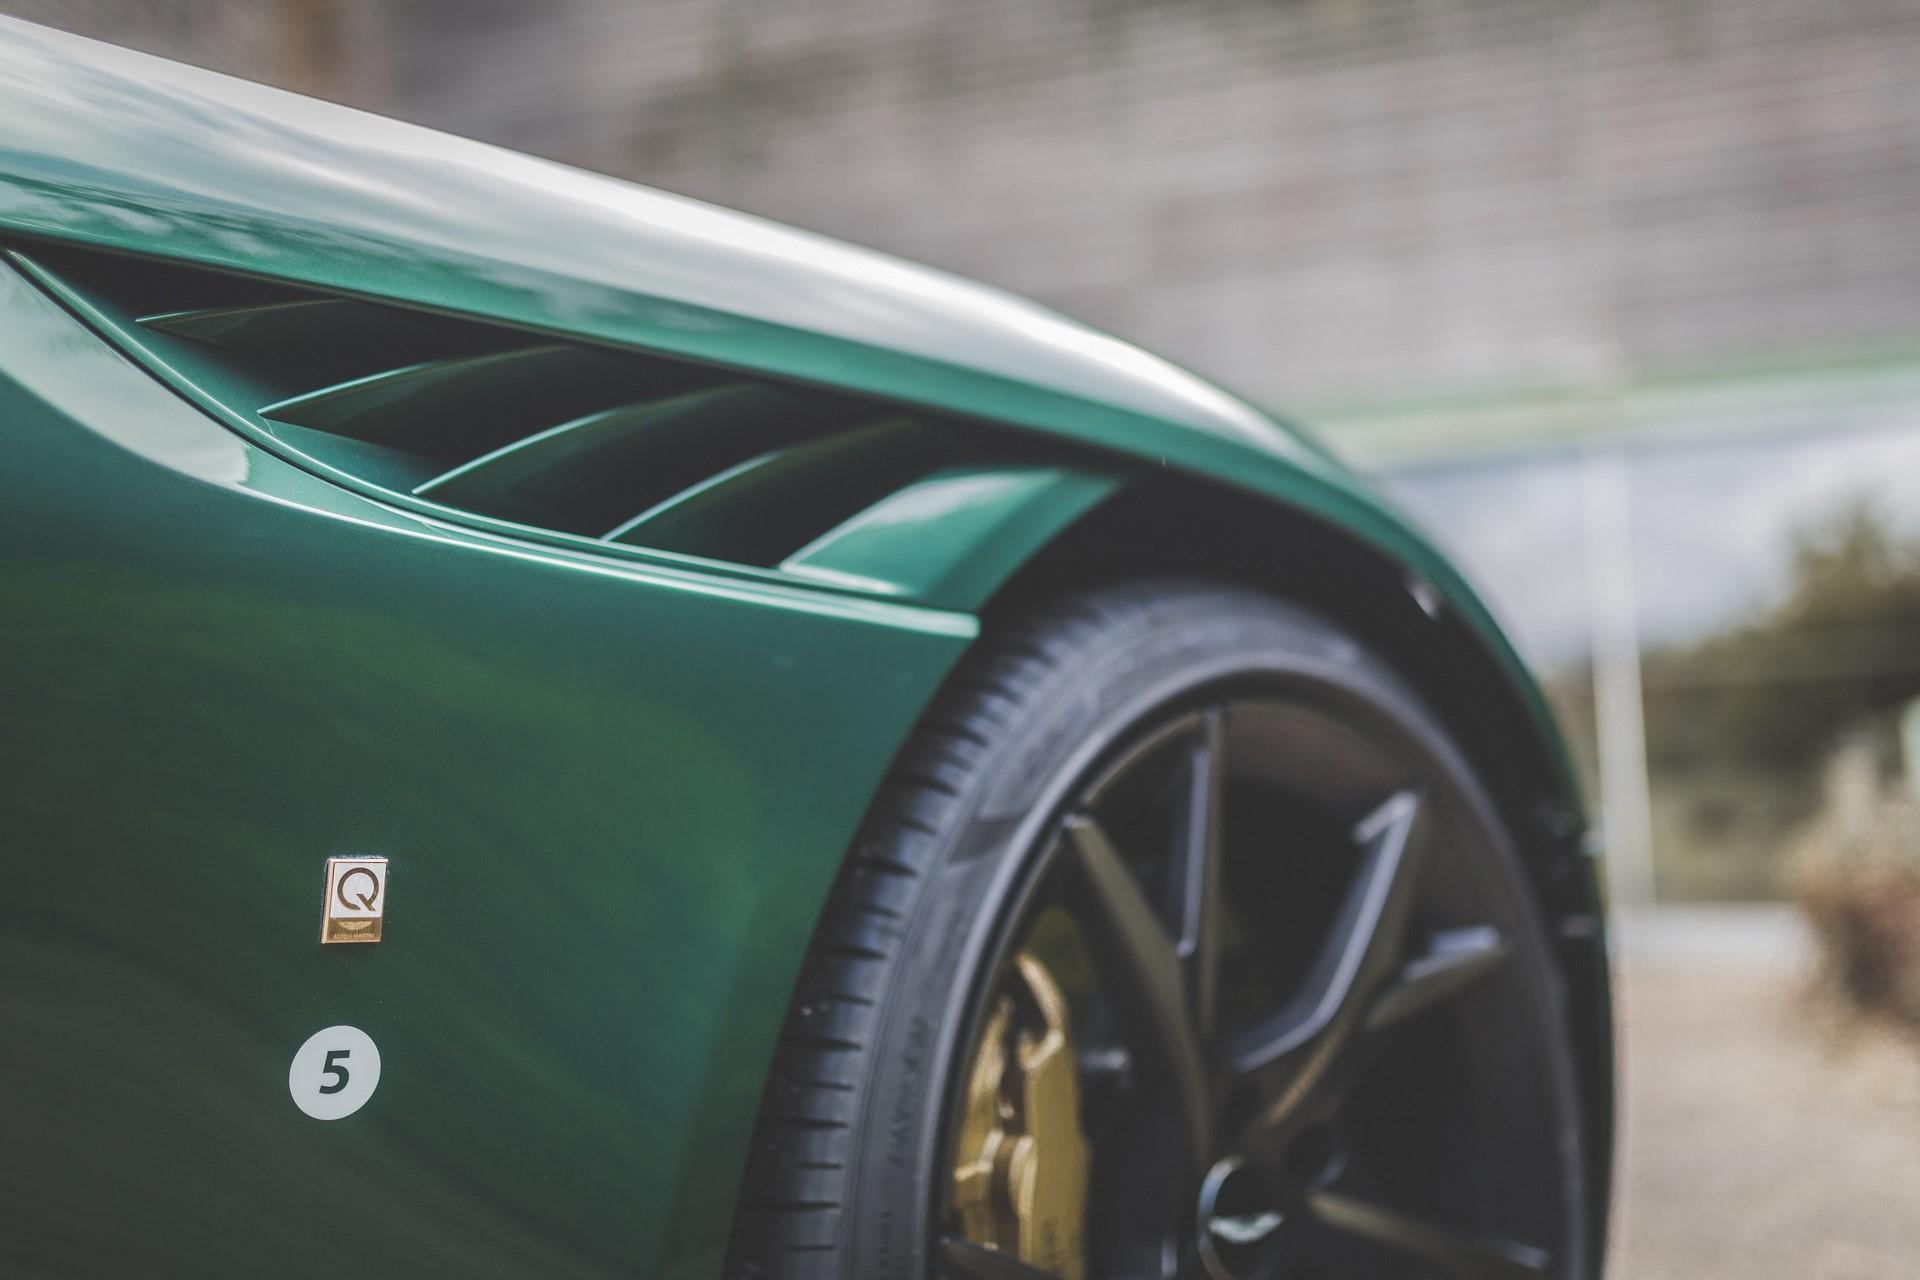 Aston-Martin-DBS-59-Edition-10